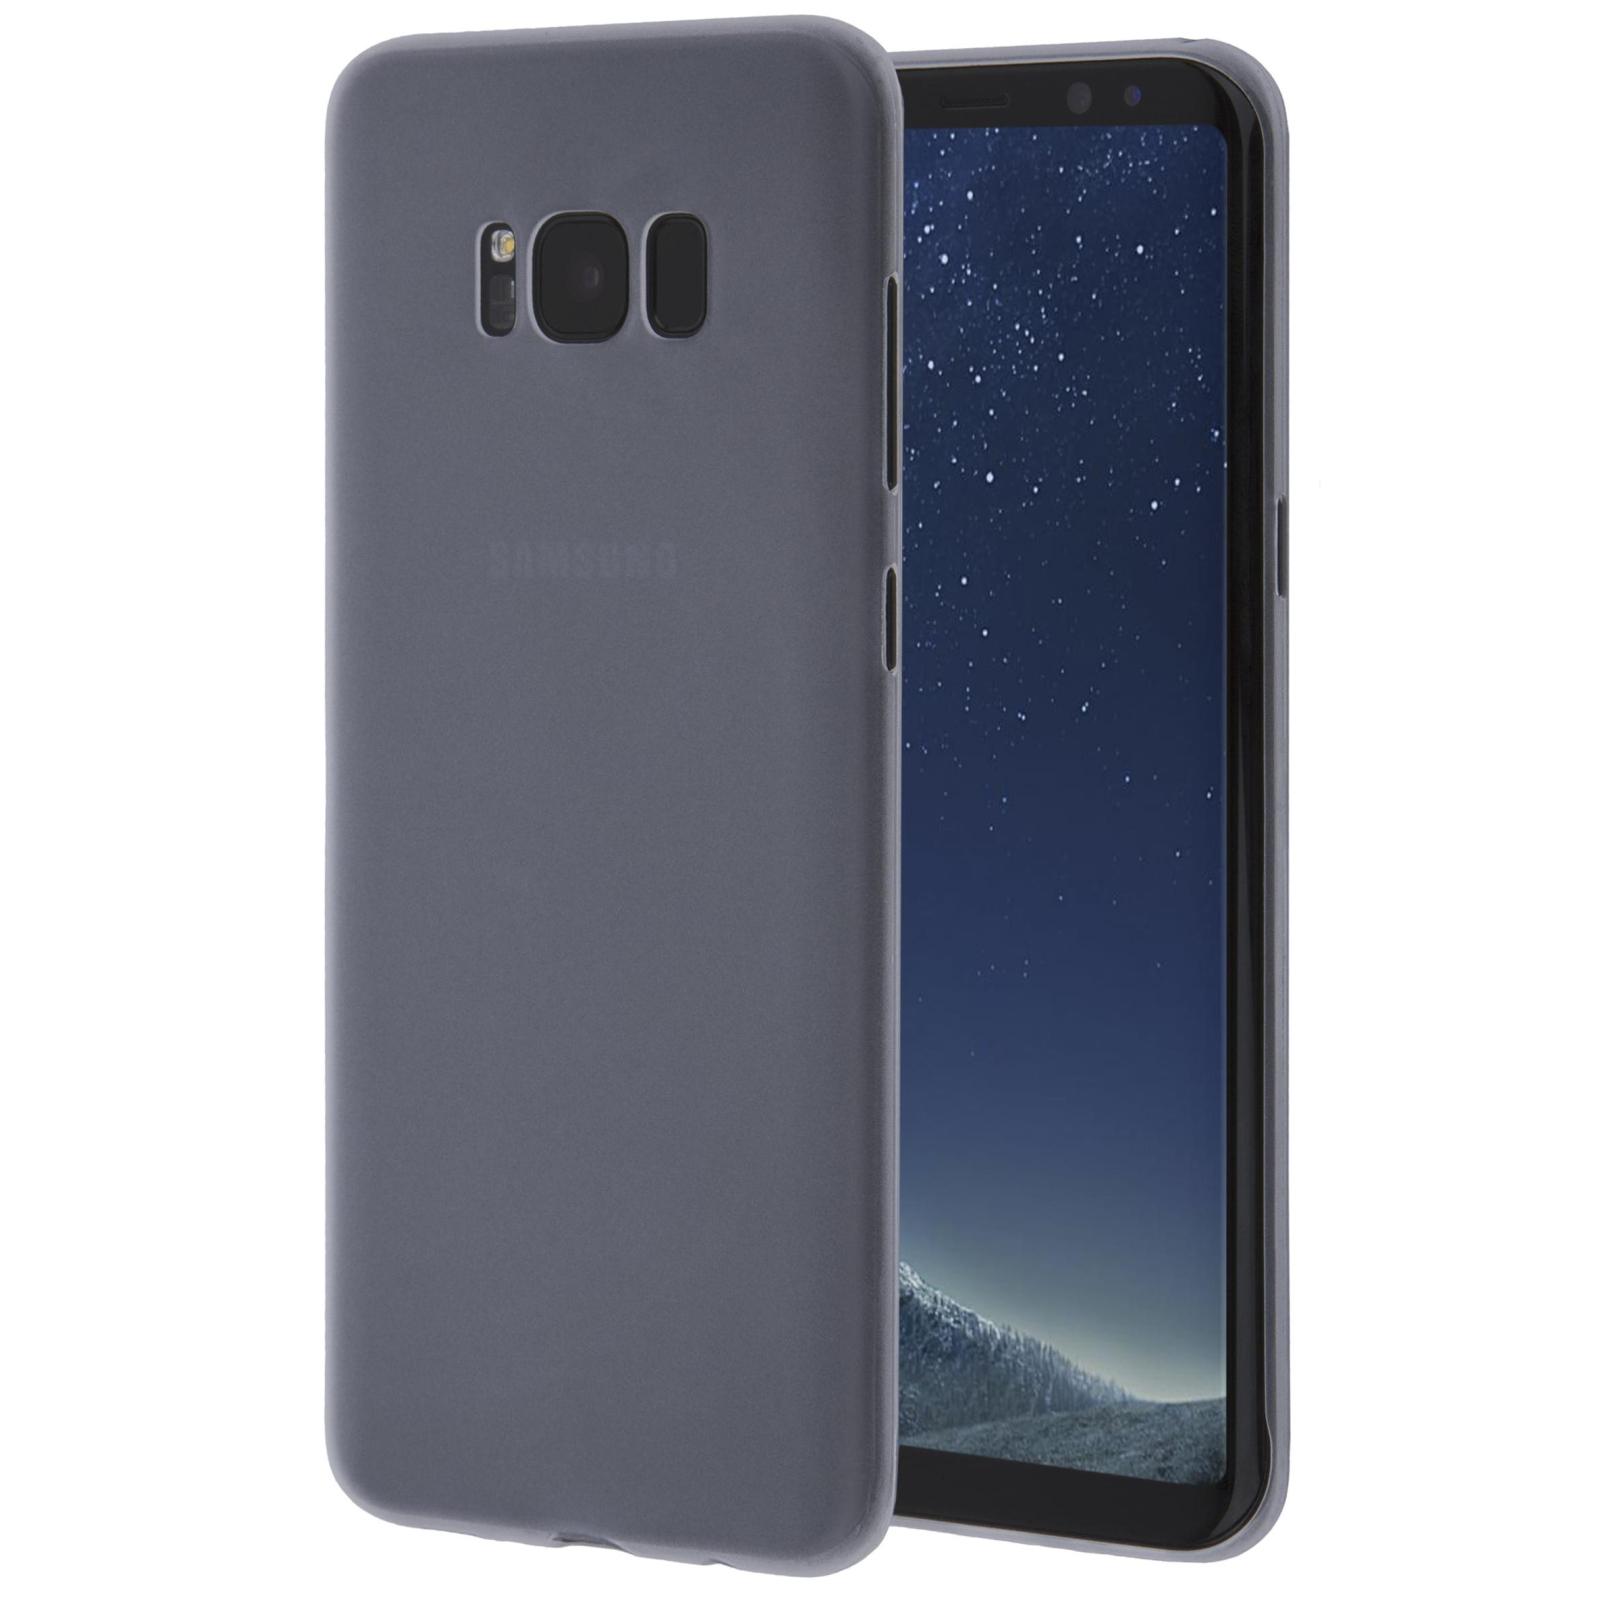 Чехол для моб. телефона MakeFuture Ice Case (PP) Samsung S8 Plus White (MCI-SS8PWH) изображение 3